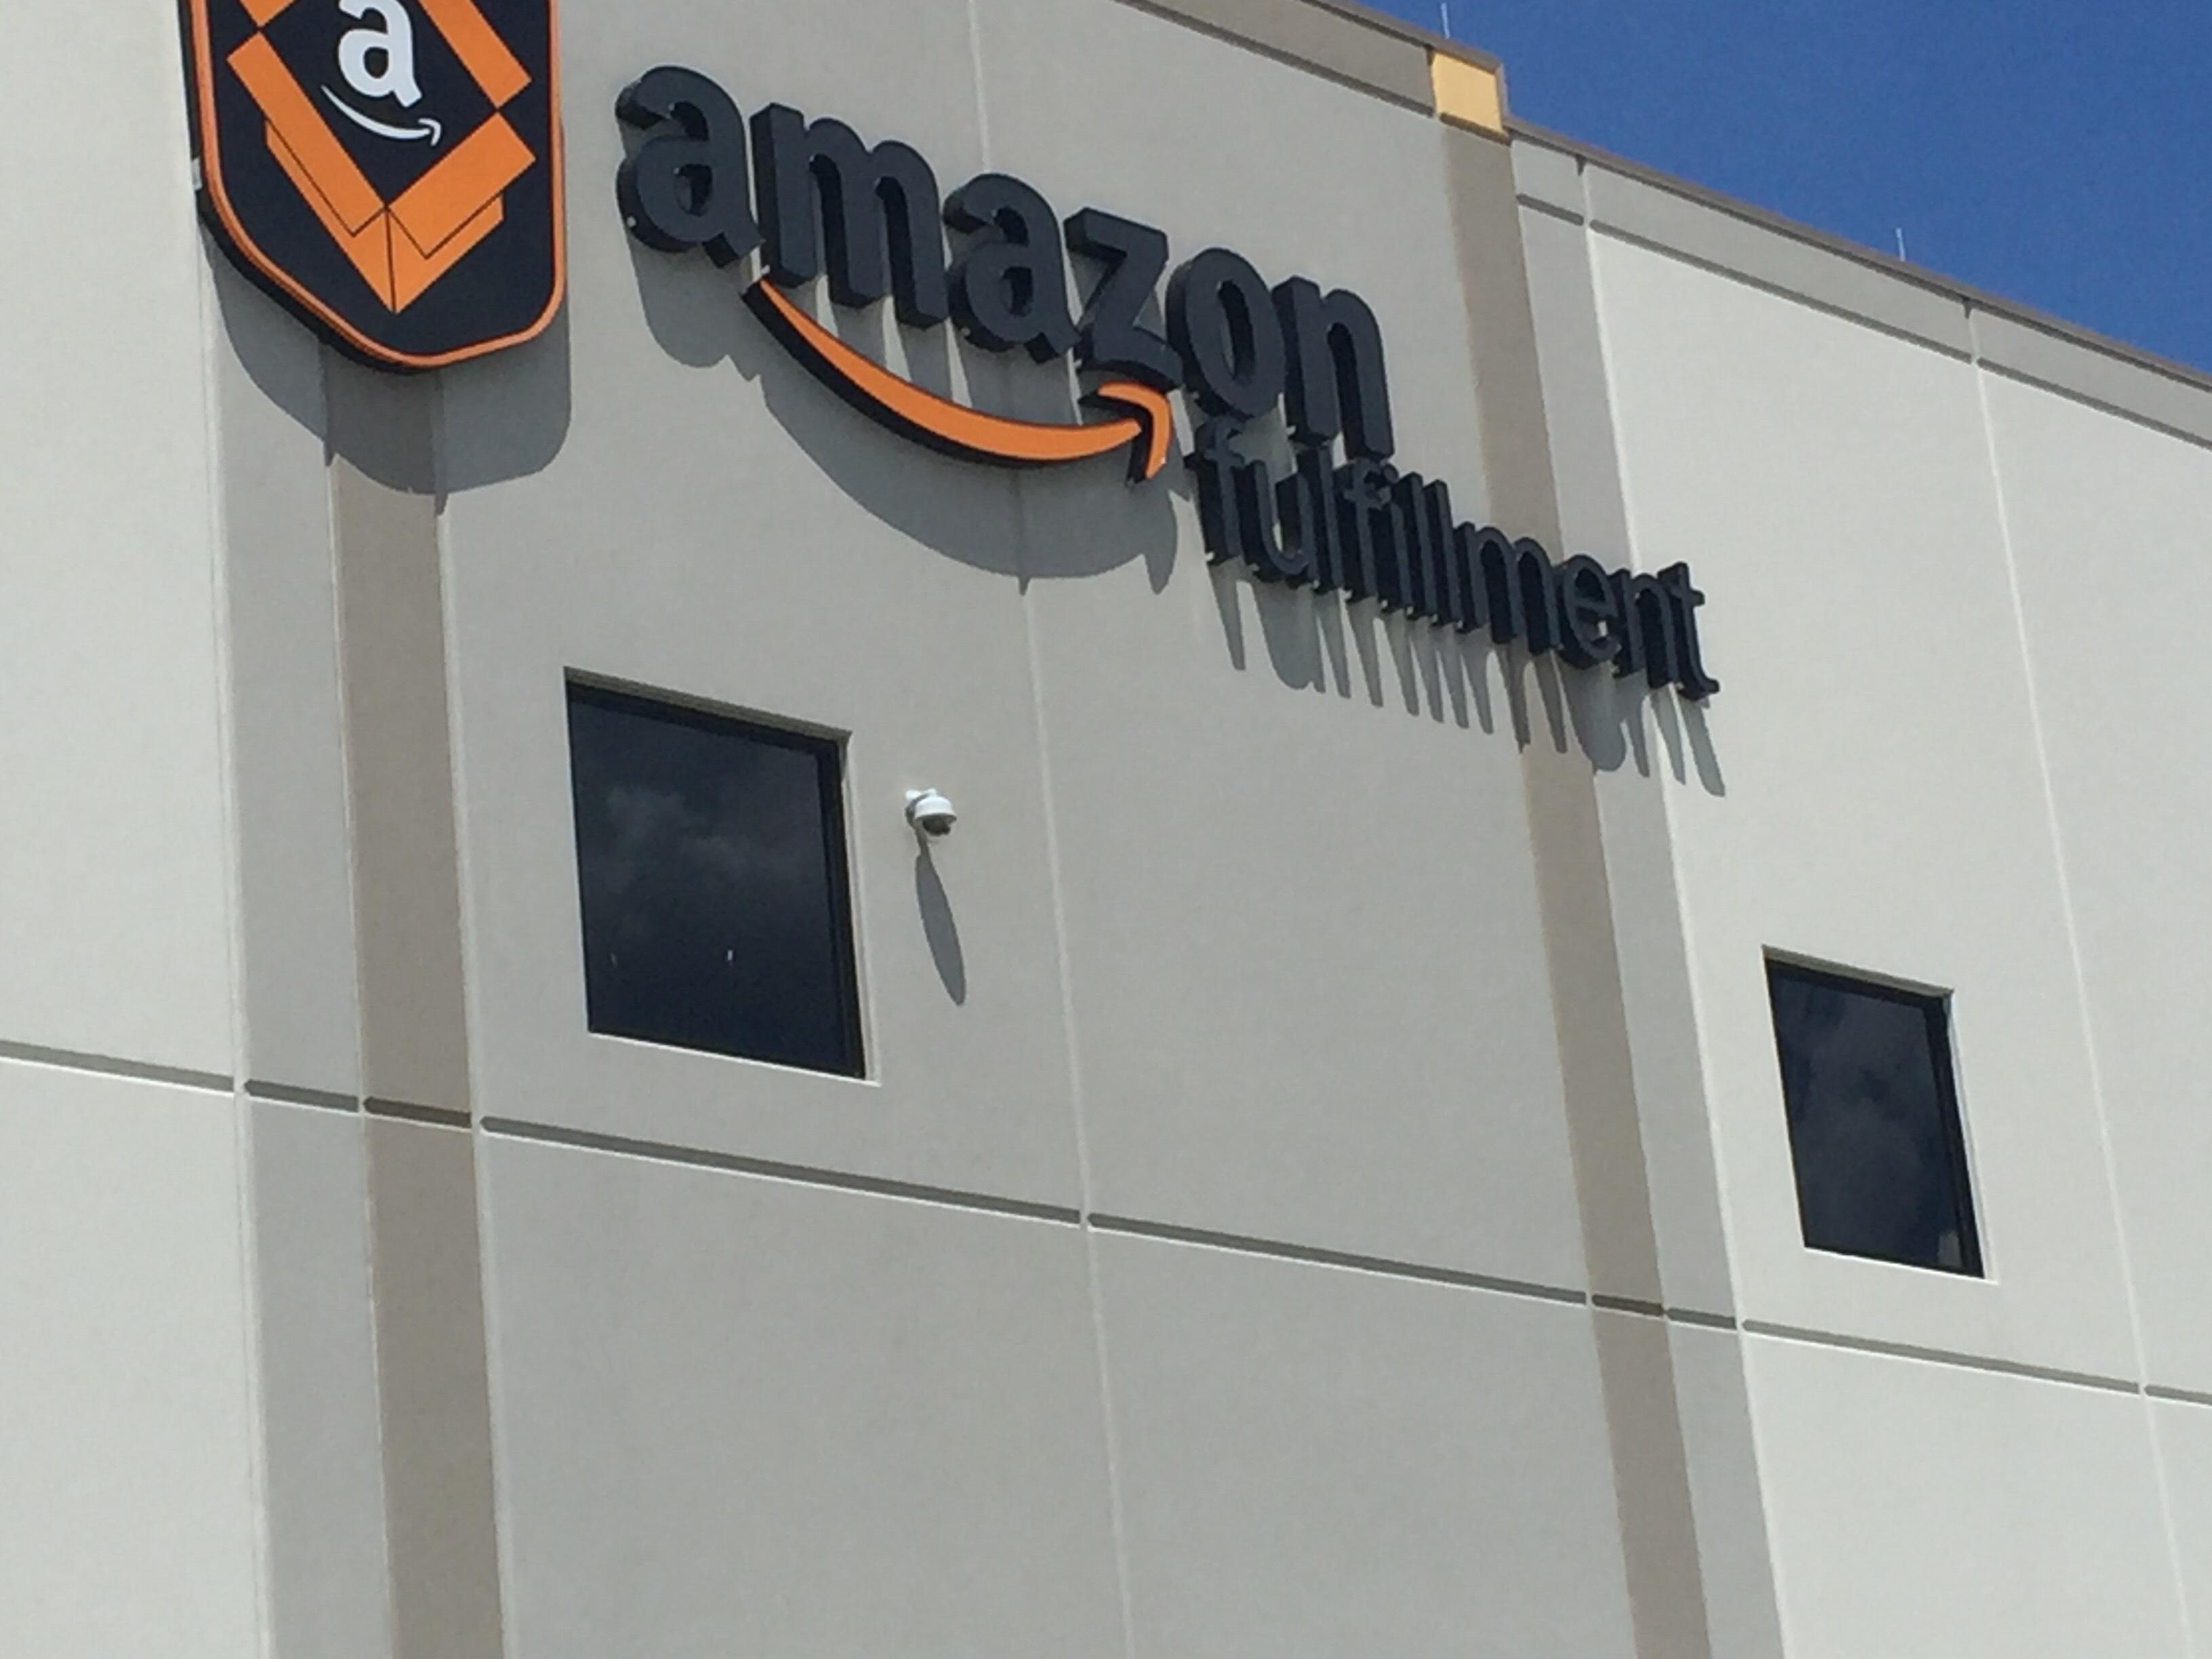 Amazon fulfillment center, Coppell, TX